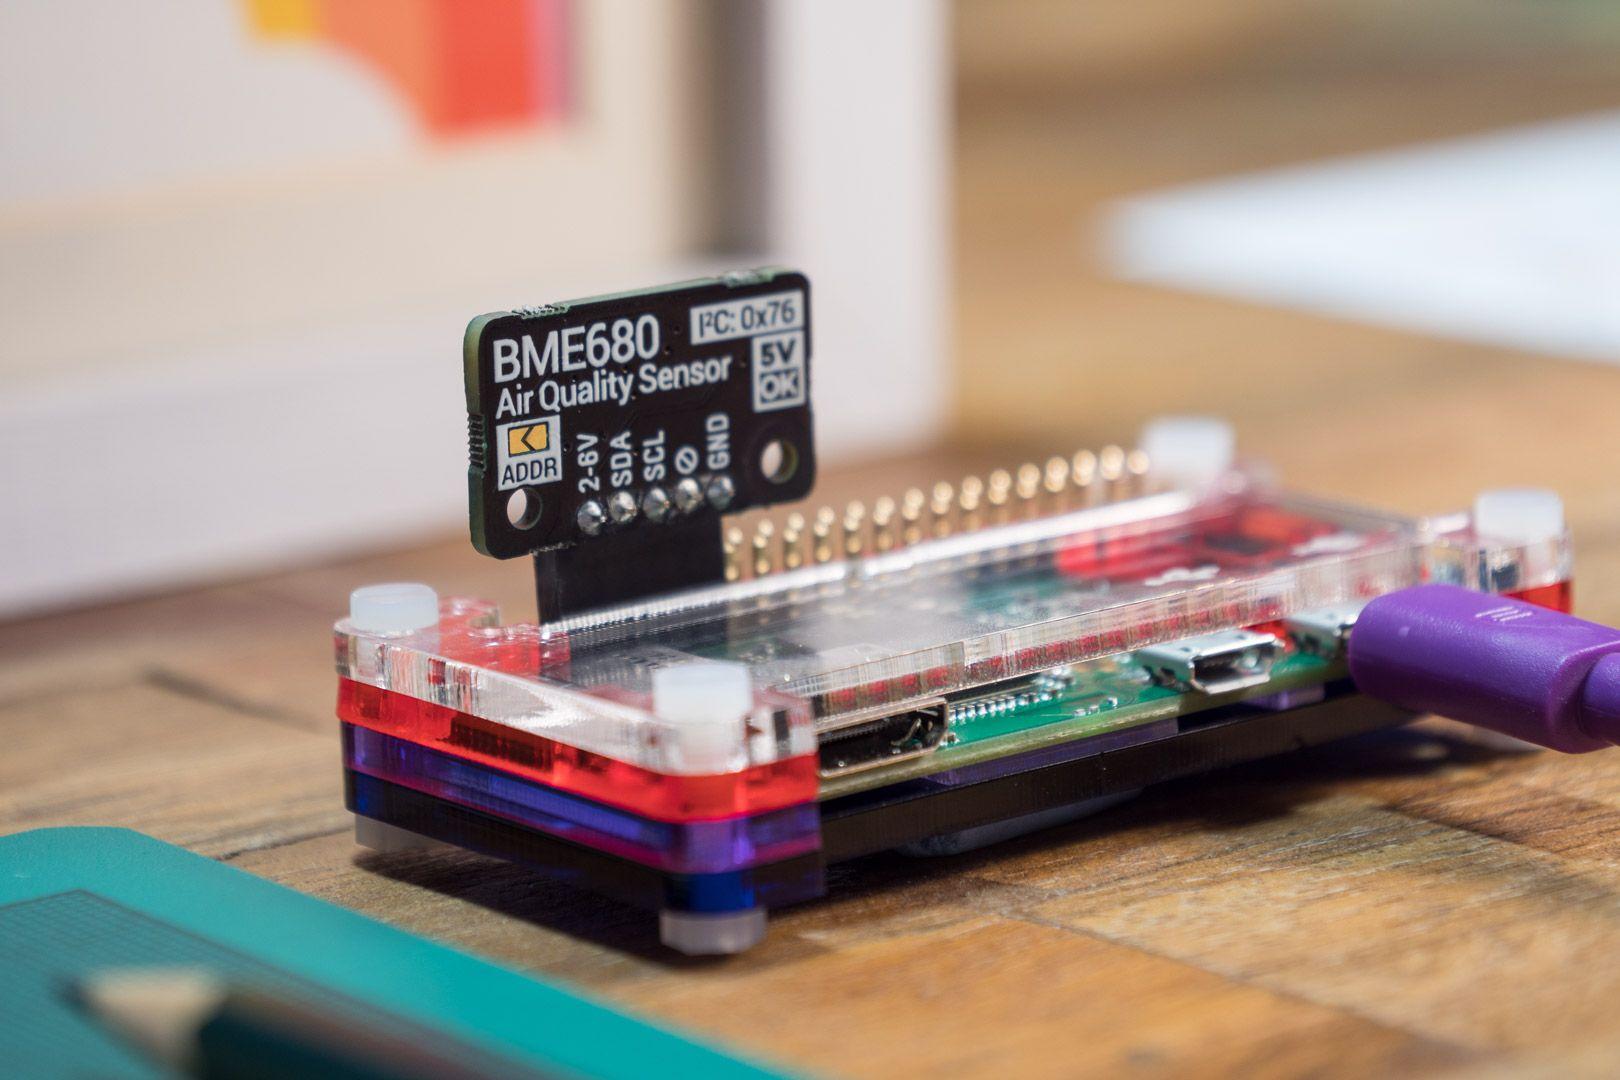 Bme680 Mounted On Pi Zero W Pinterest Arduino Diy And Usb Hub Buy Electronic Printed Circuit Boardboard Hubcircuit